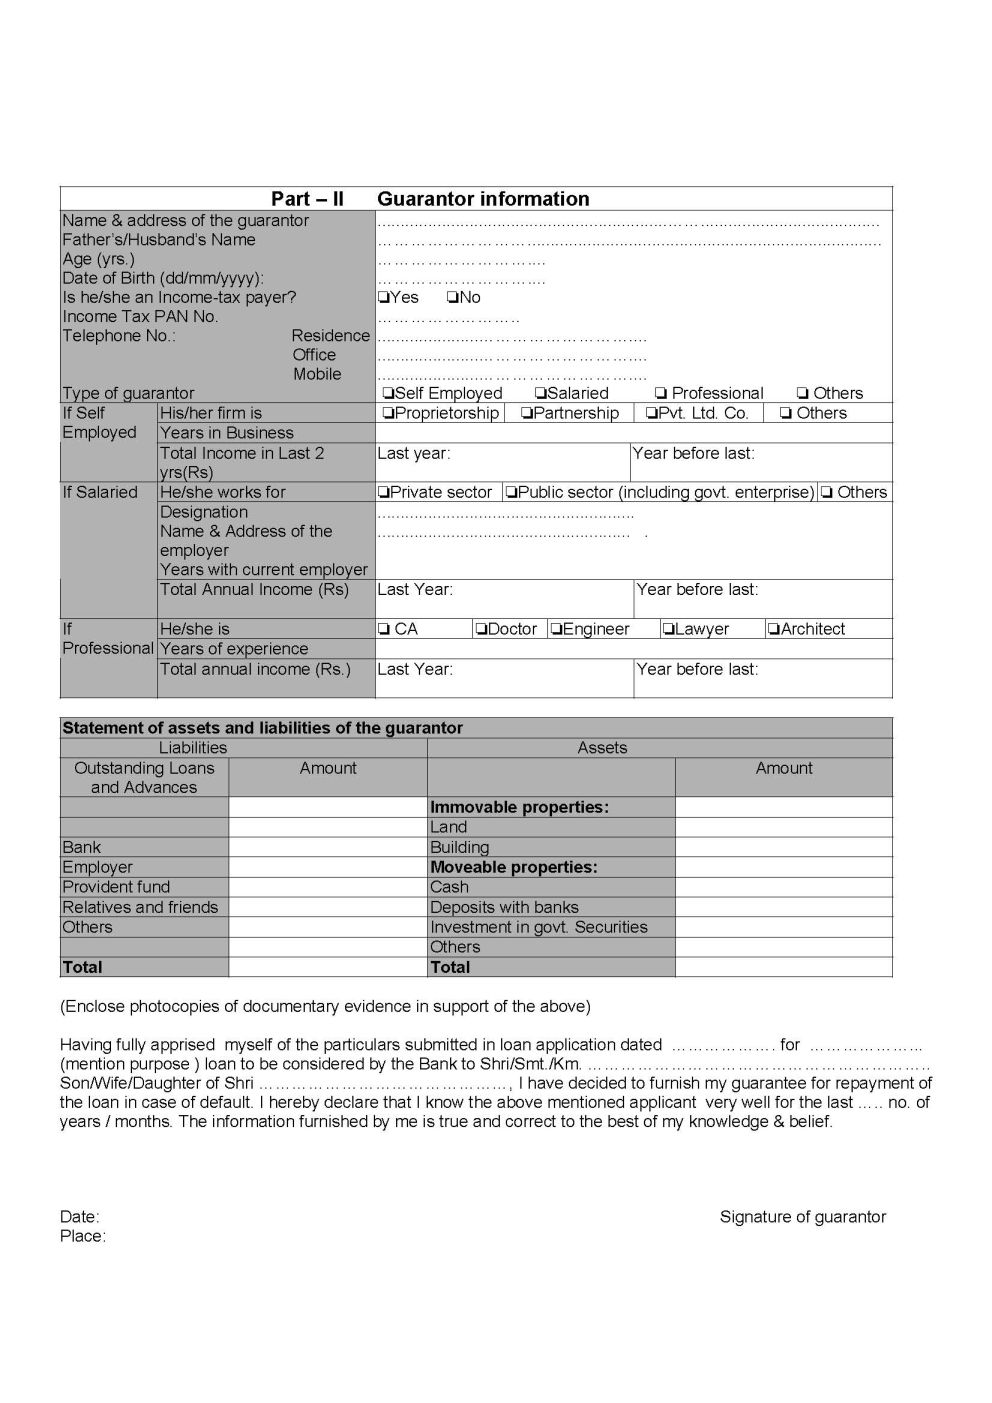 car loan amortization schedule excel unique amortization 3 loan